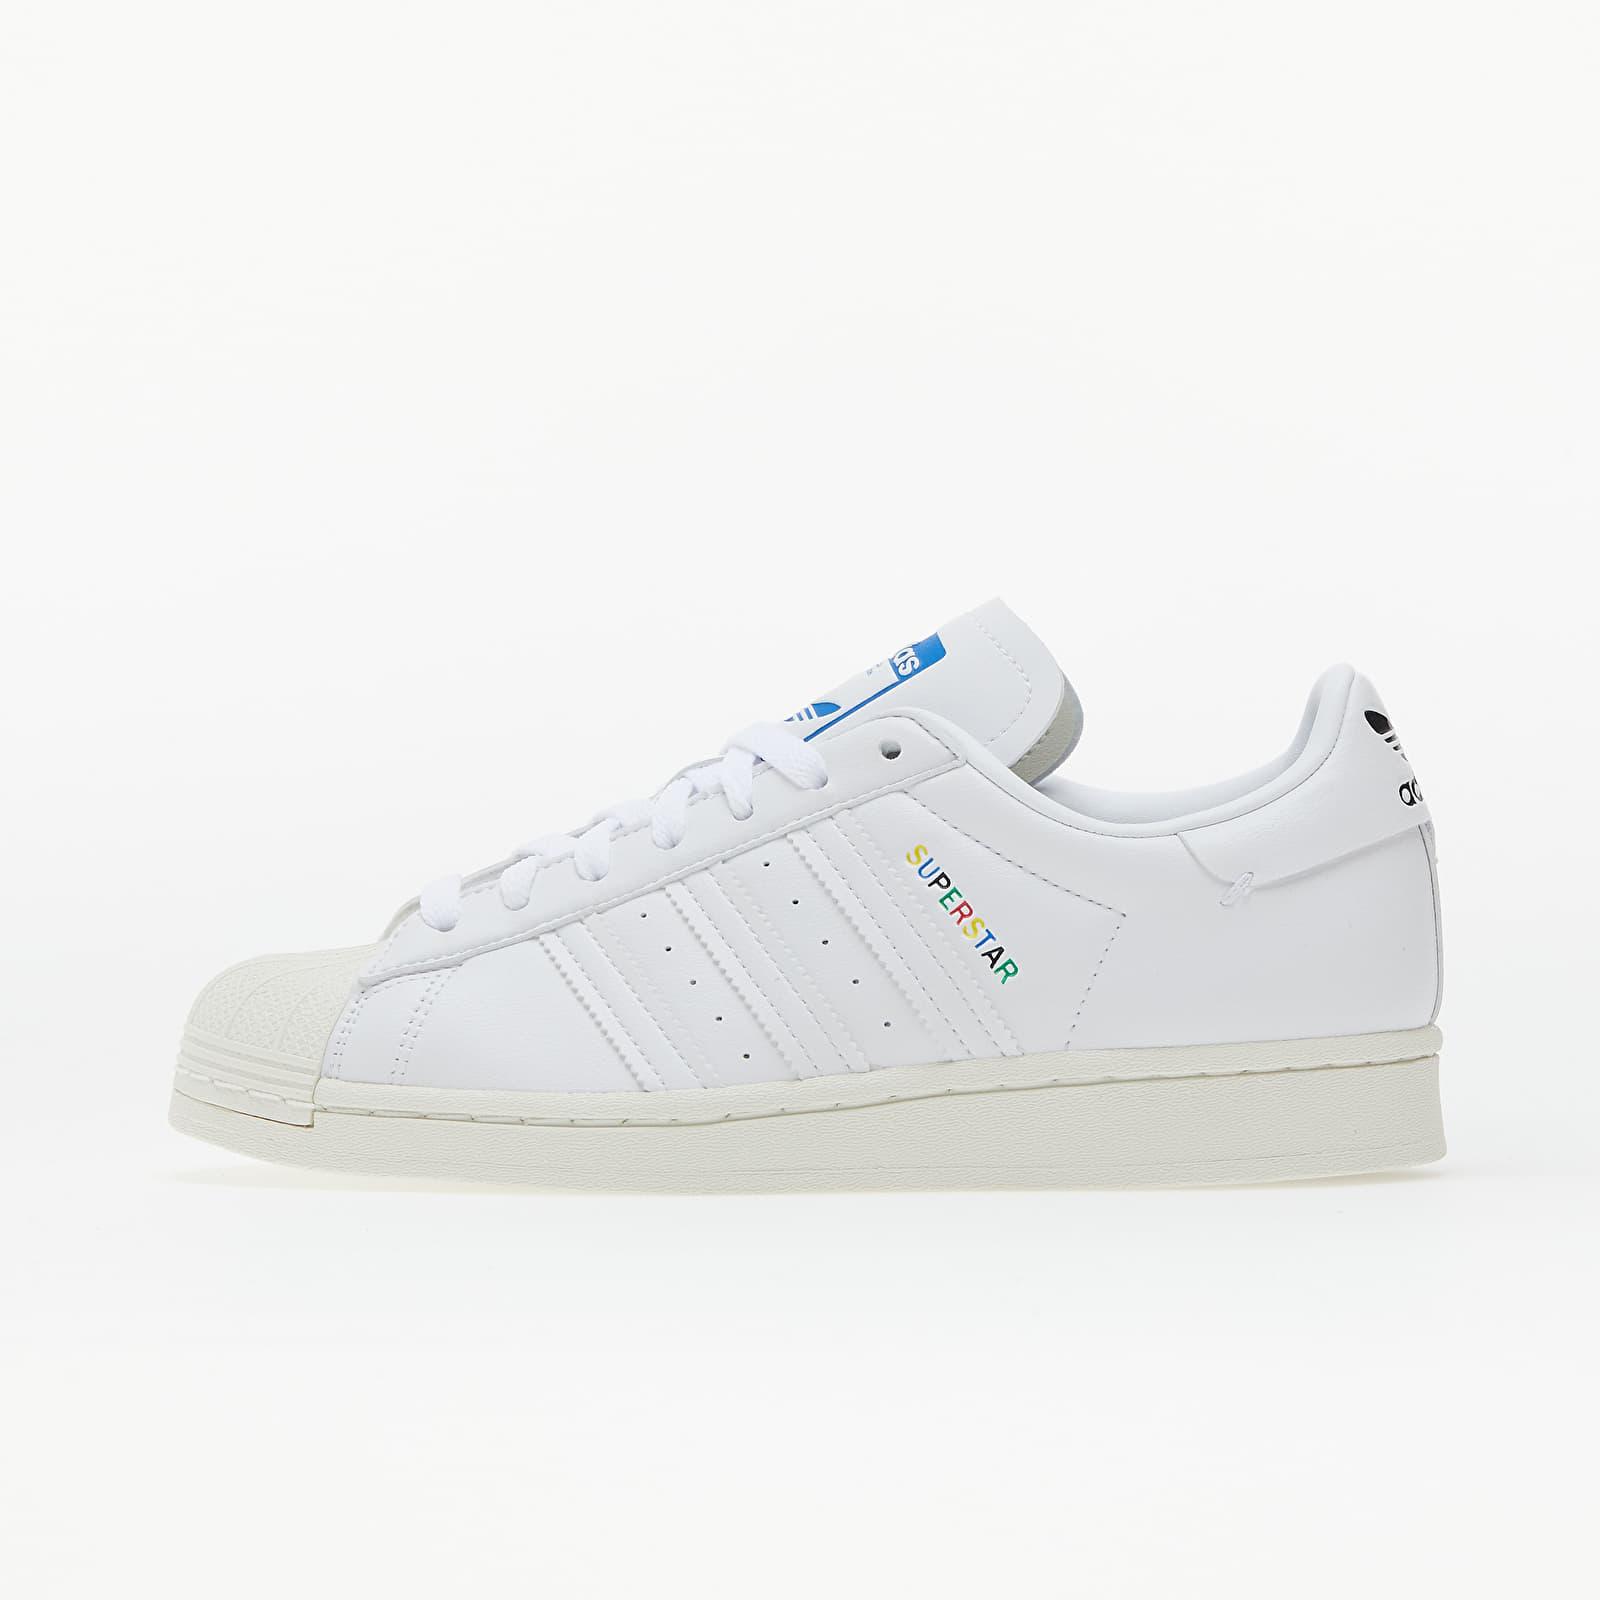 adidas Superstar W Ftw White/ Ftw White/ Off White EUR 40